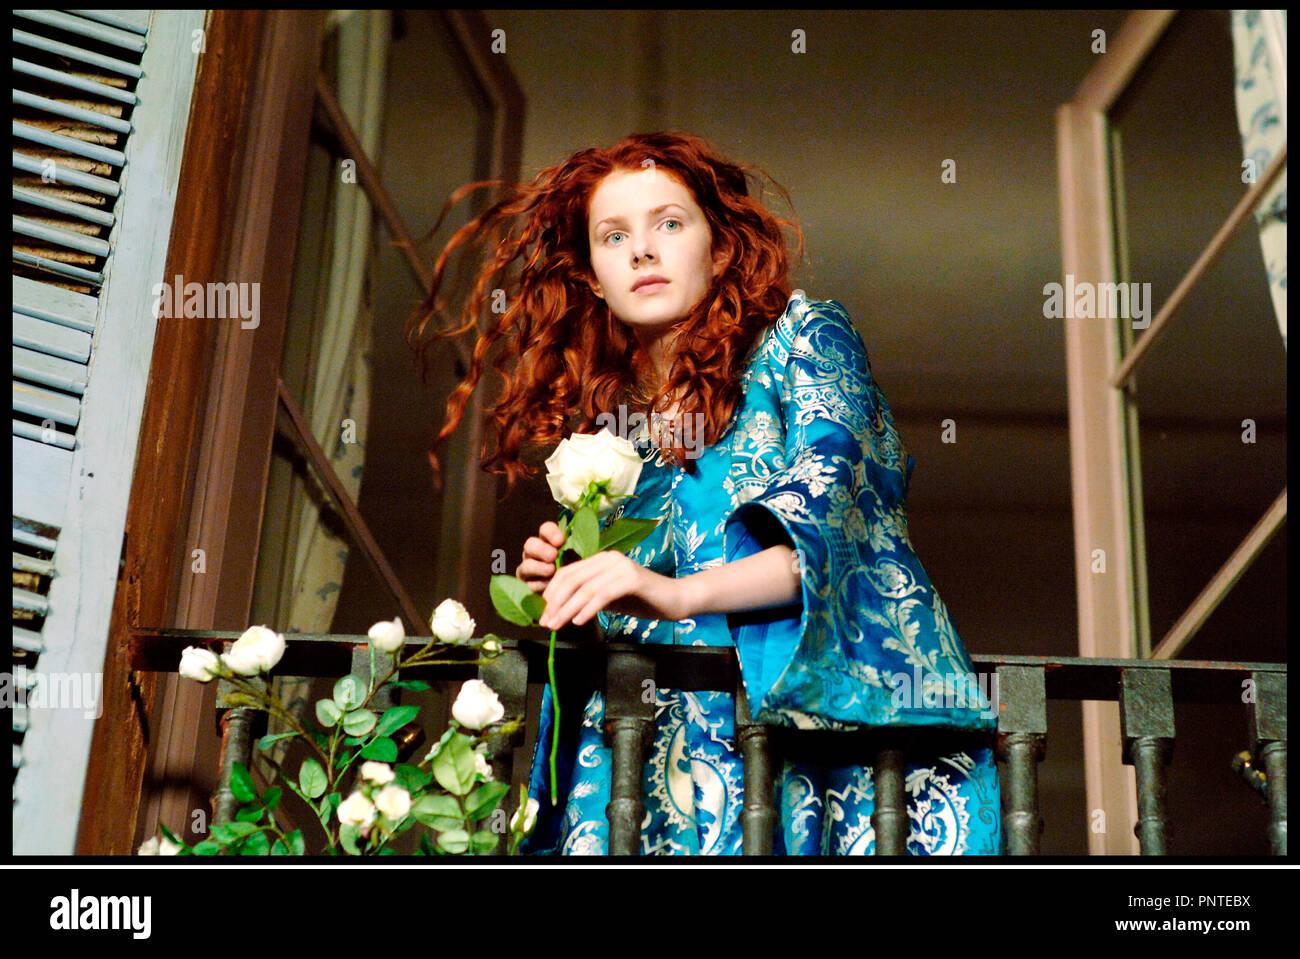 Rachel Hurd Wood Perfume Story Murderer Stock Photos Rachel Hurd